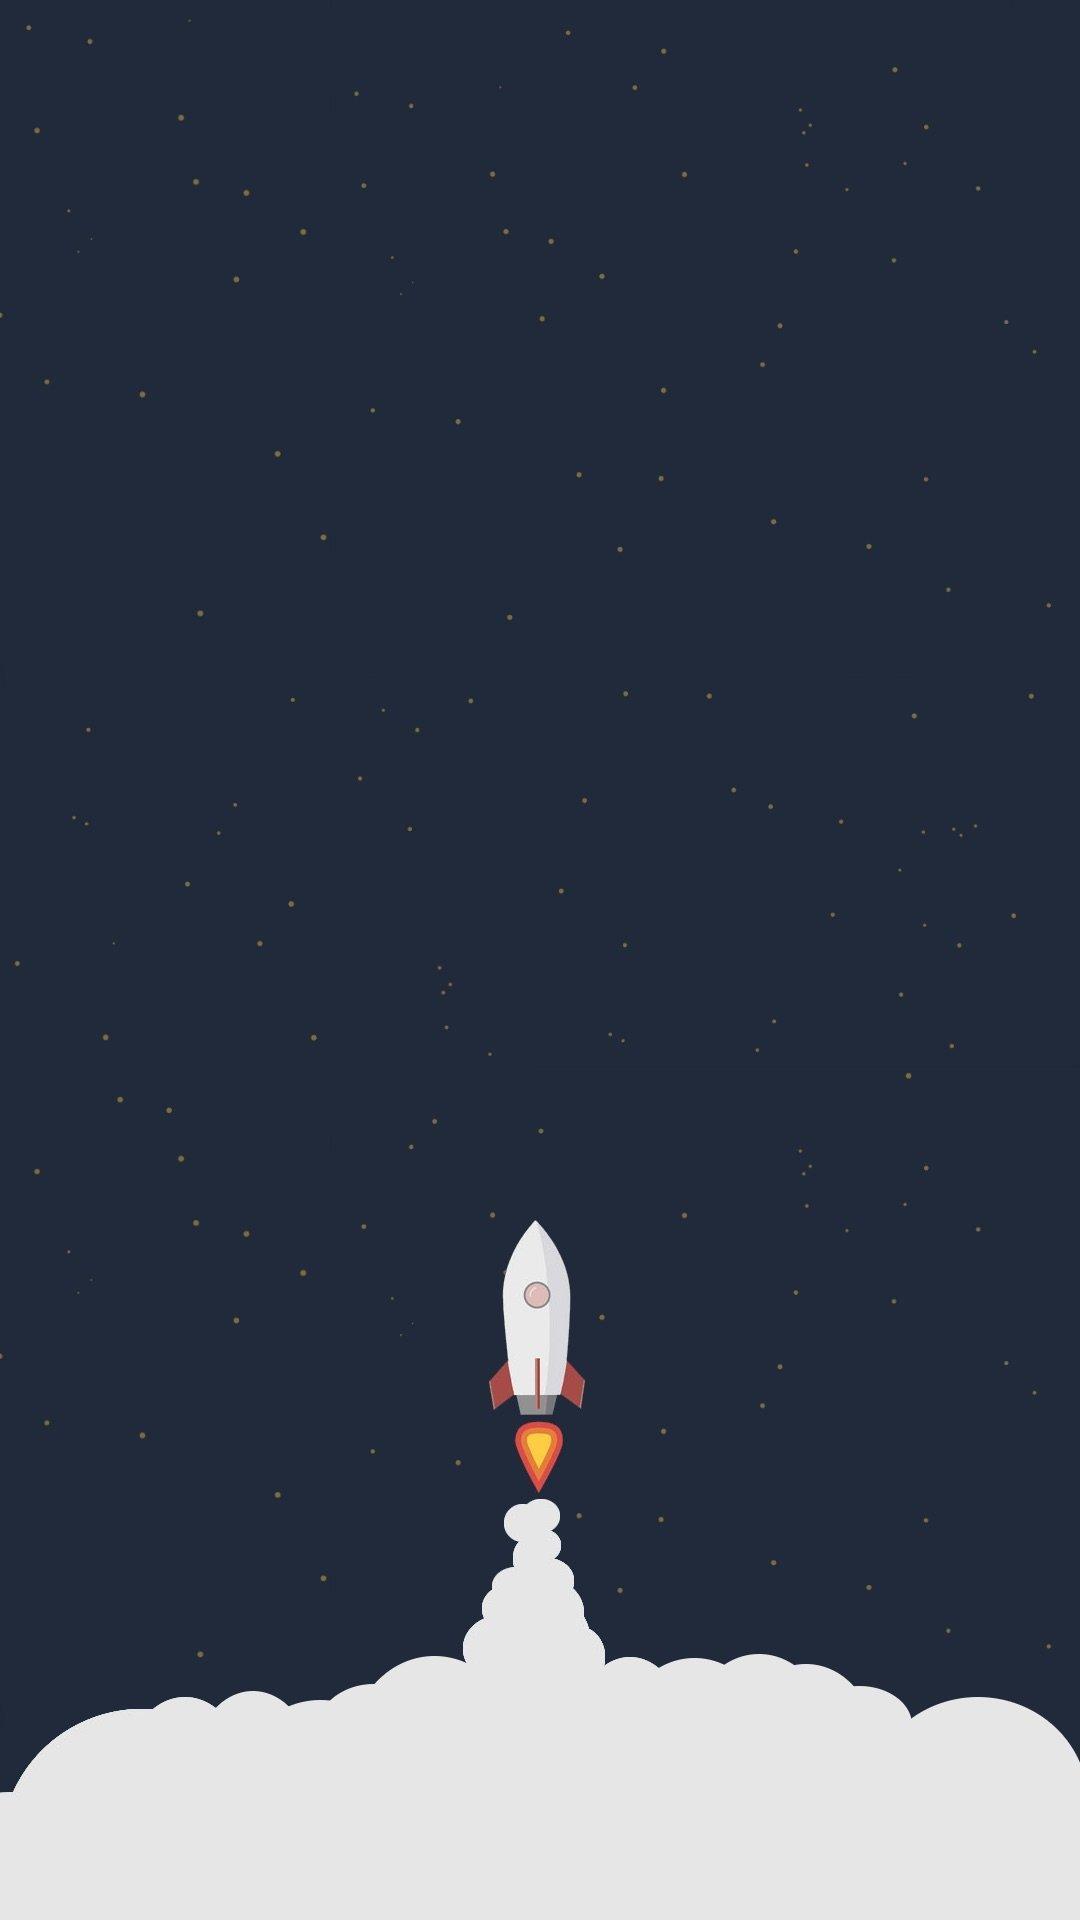 Geekhound iPhone wallpaper